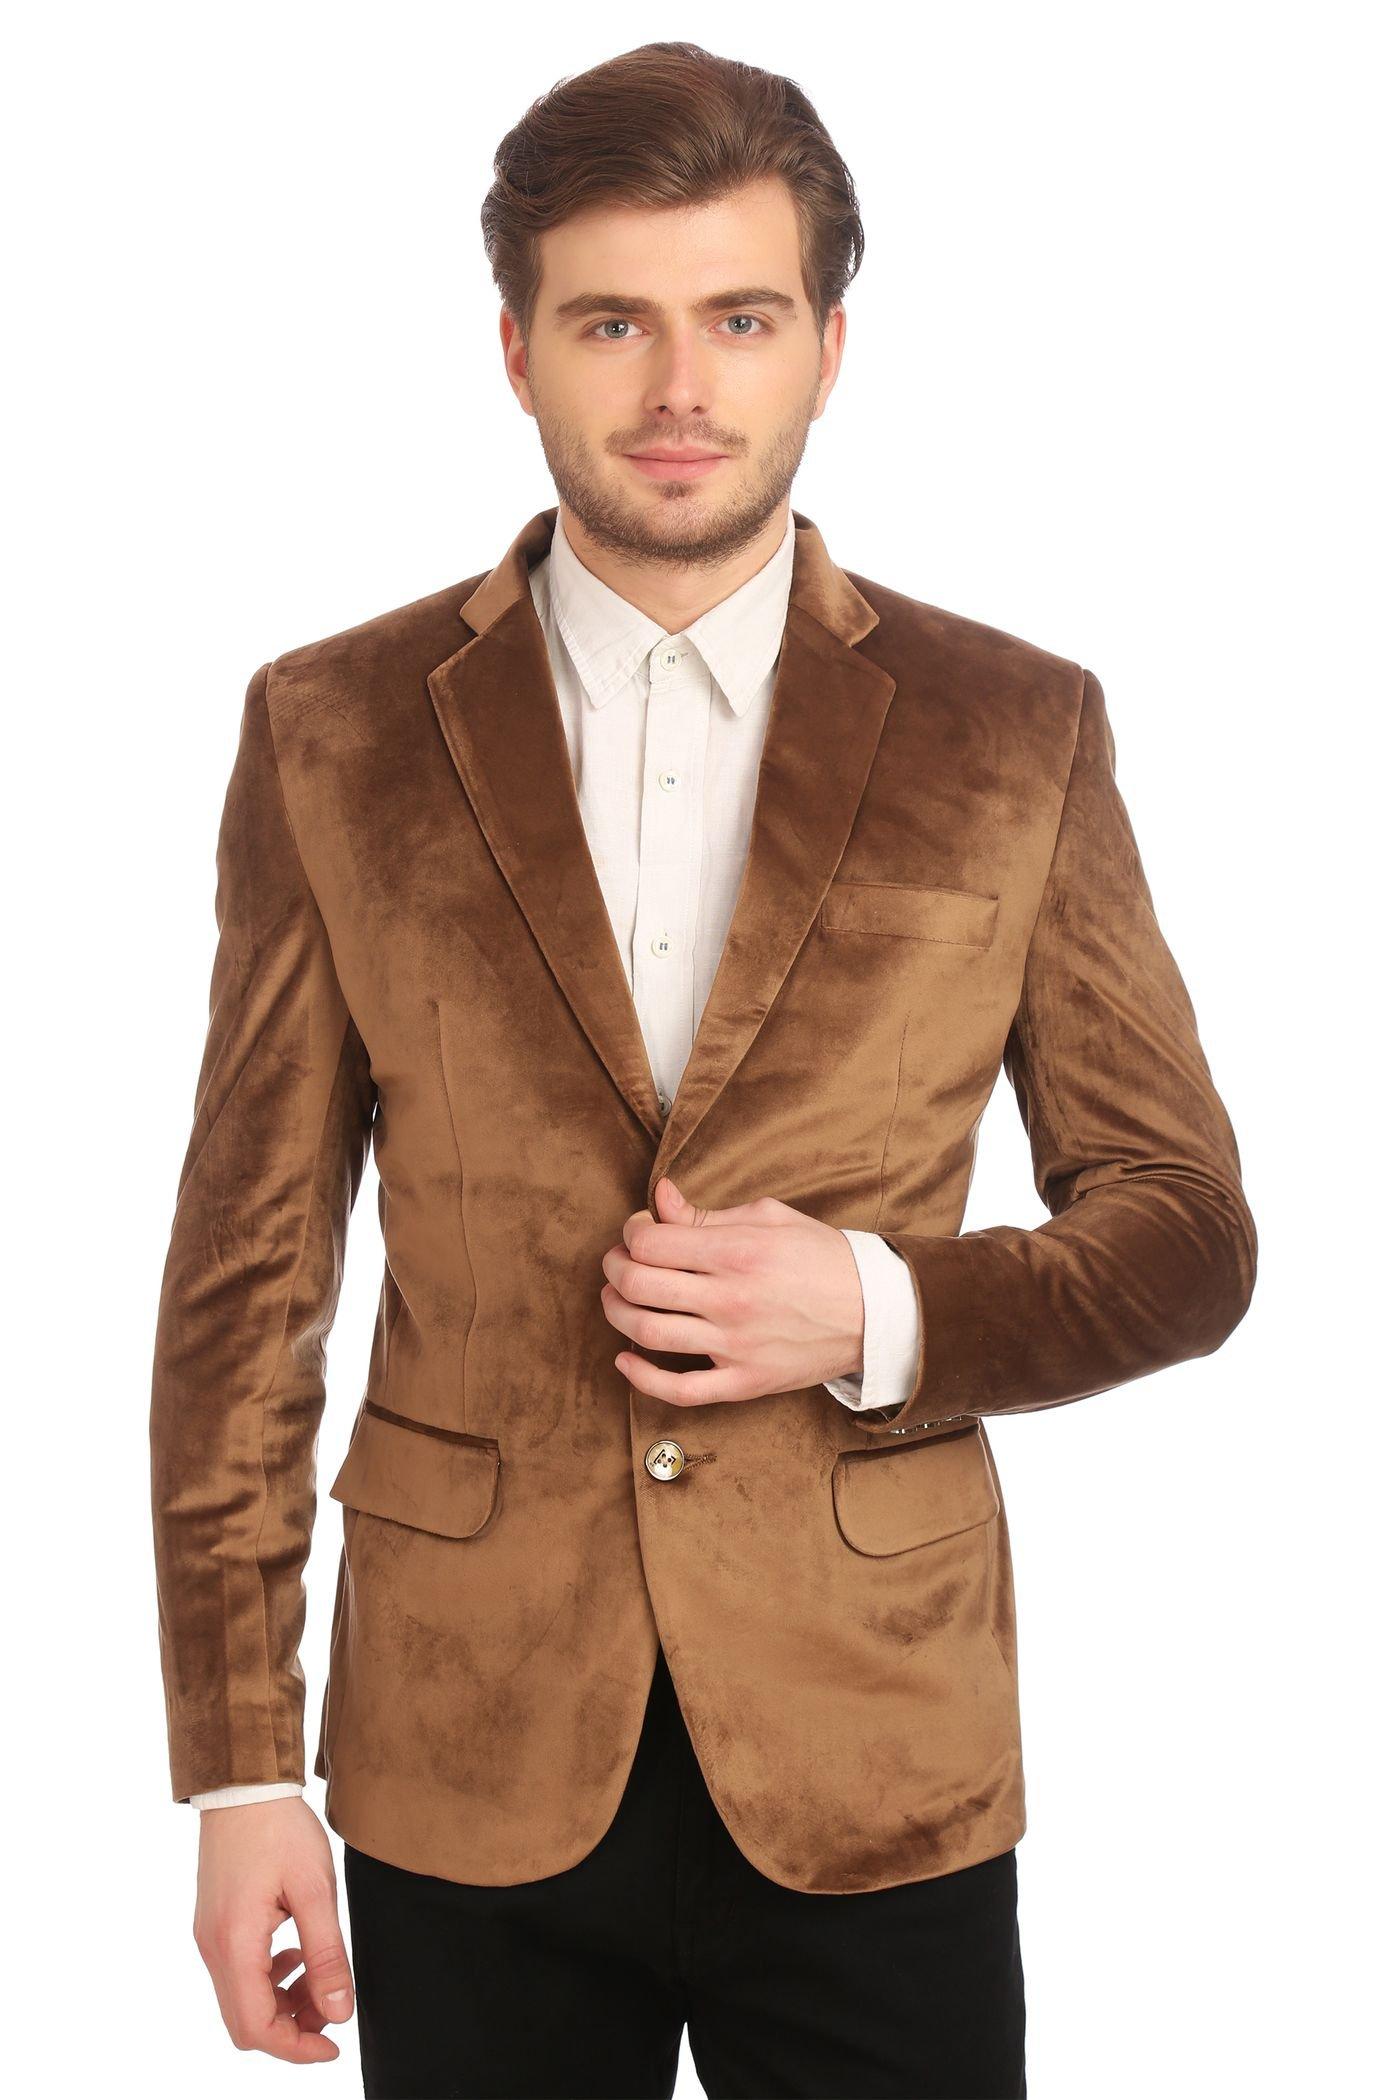 Wintage Men's Velvet Two Buttoned Notch Lapel Party Camel Coat Blazer-5XL by WINTAGE